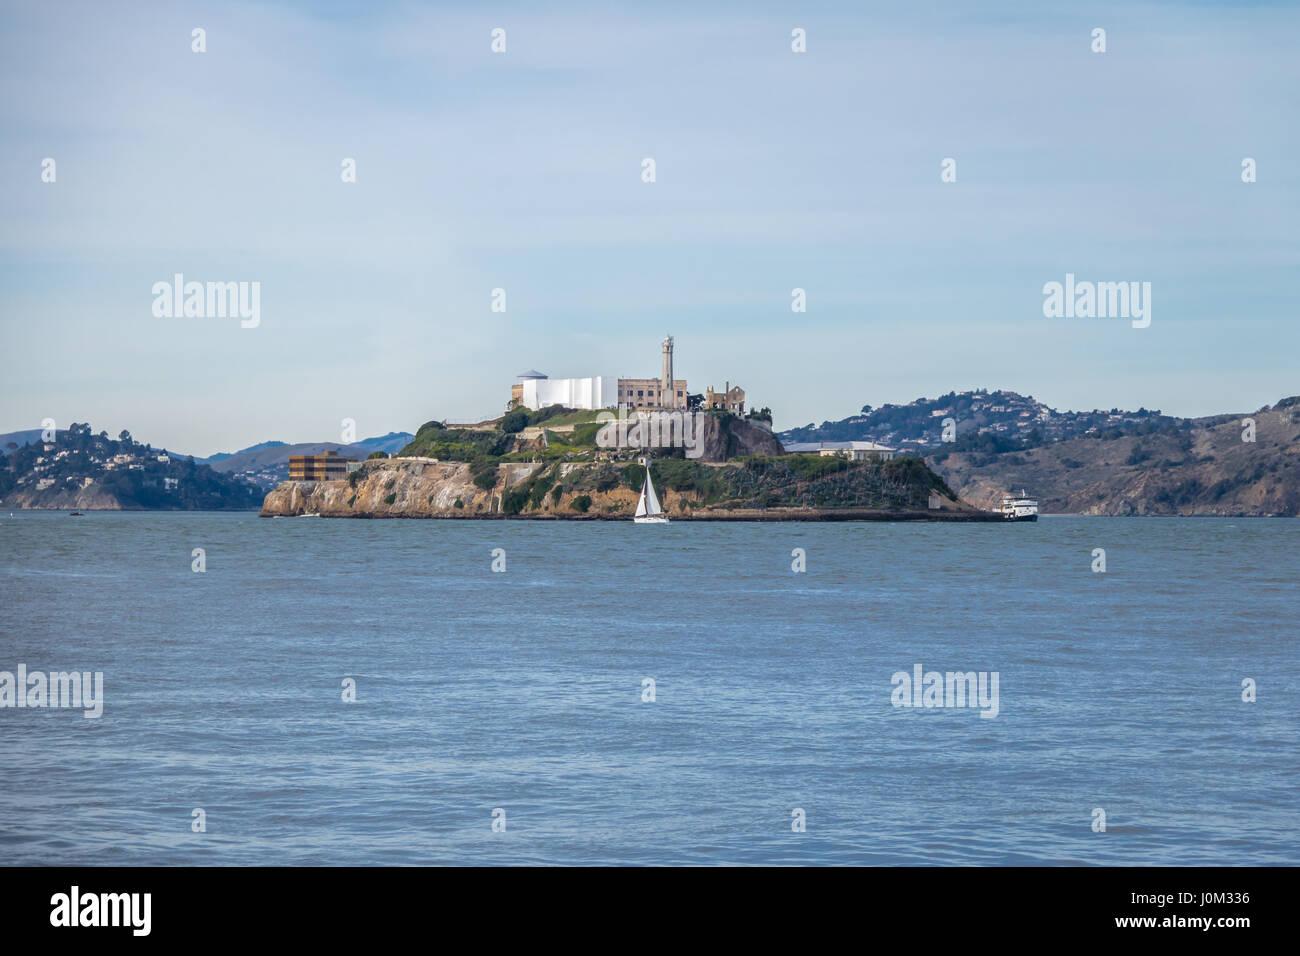 La Isla de Alcatraz - San Francisco, California, EE.UU. Foto de stock